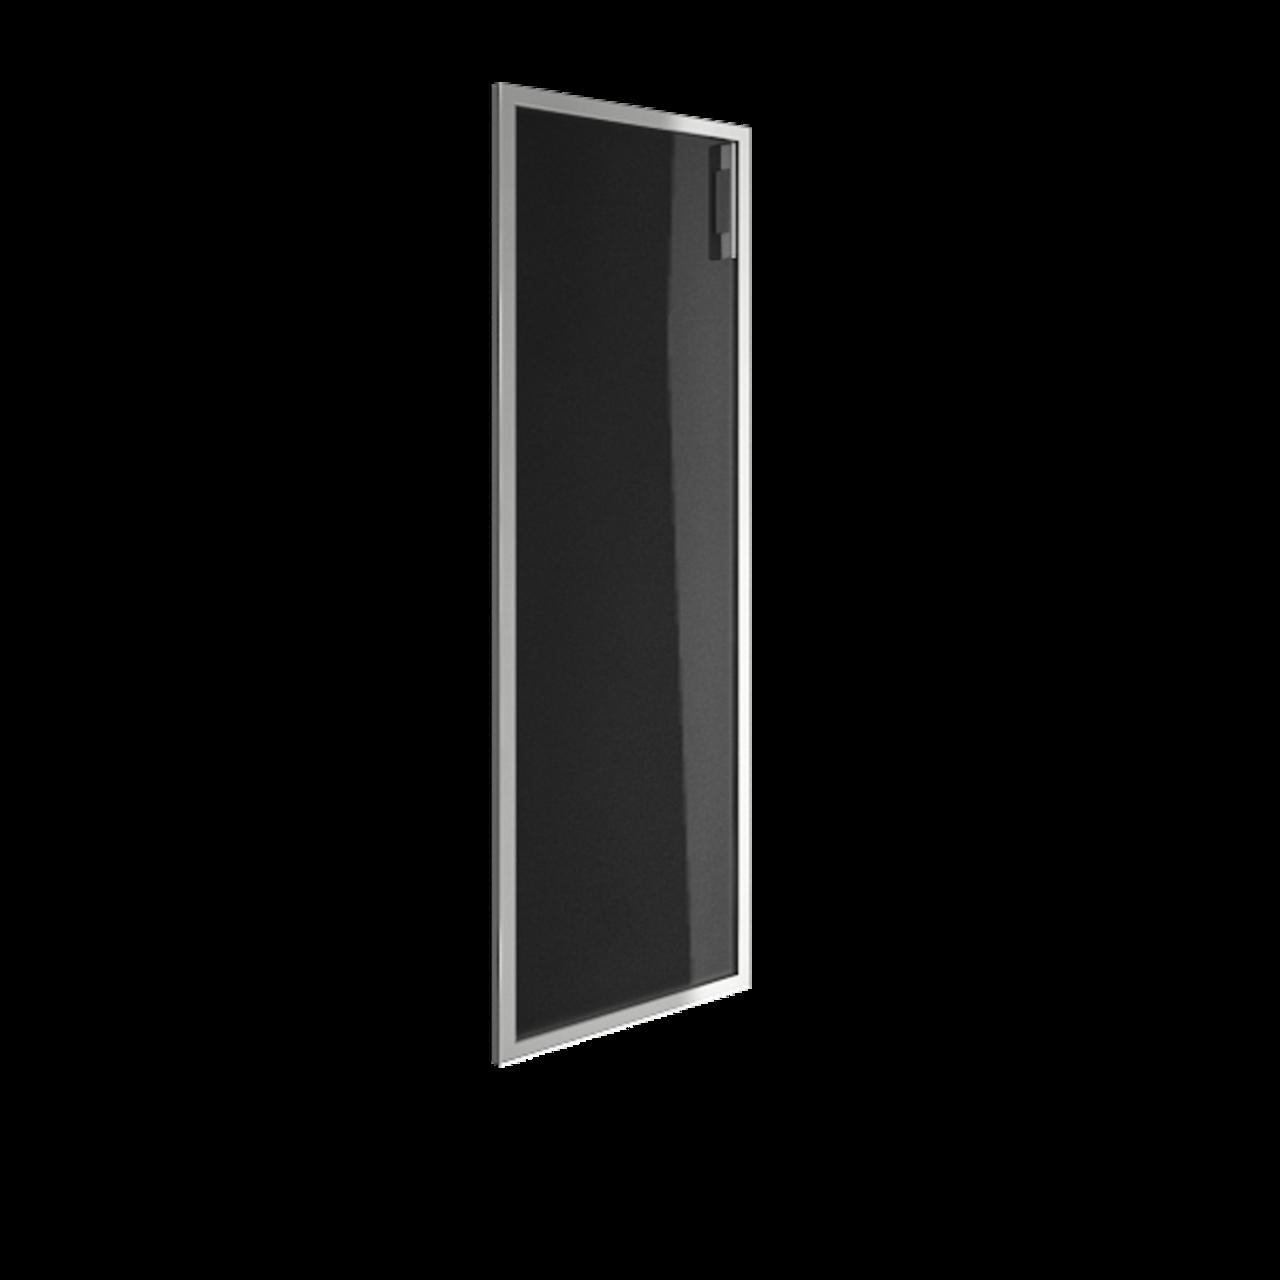 Дверь стекло в раме среднее Lacobel black левая - фото 2